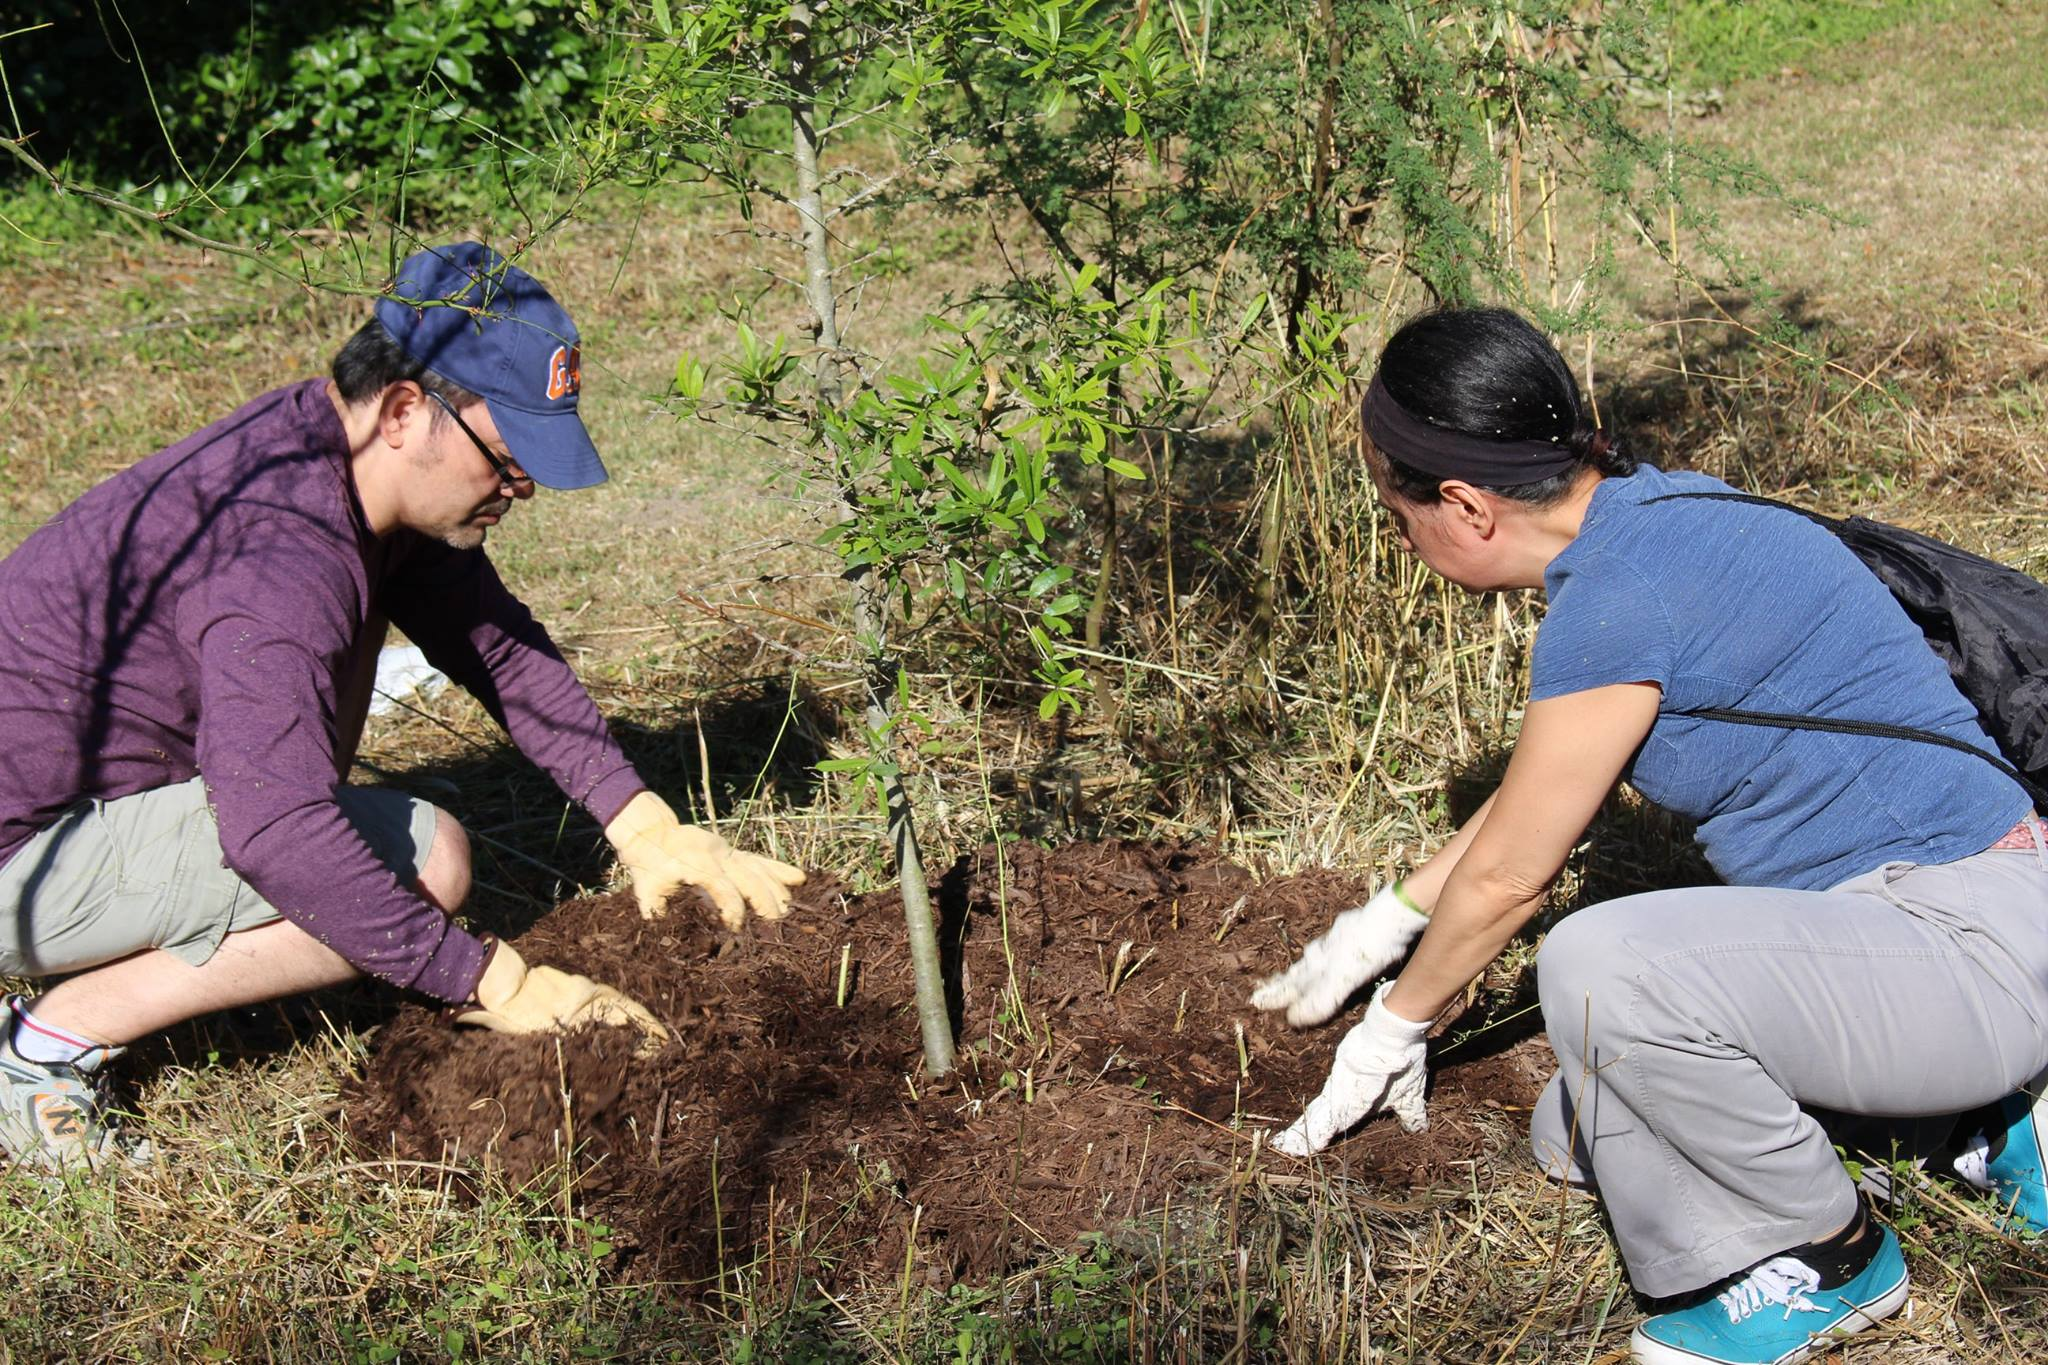 River Warrior volunteers taking part in tree planting event